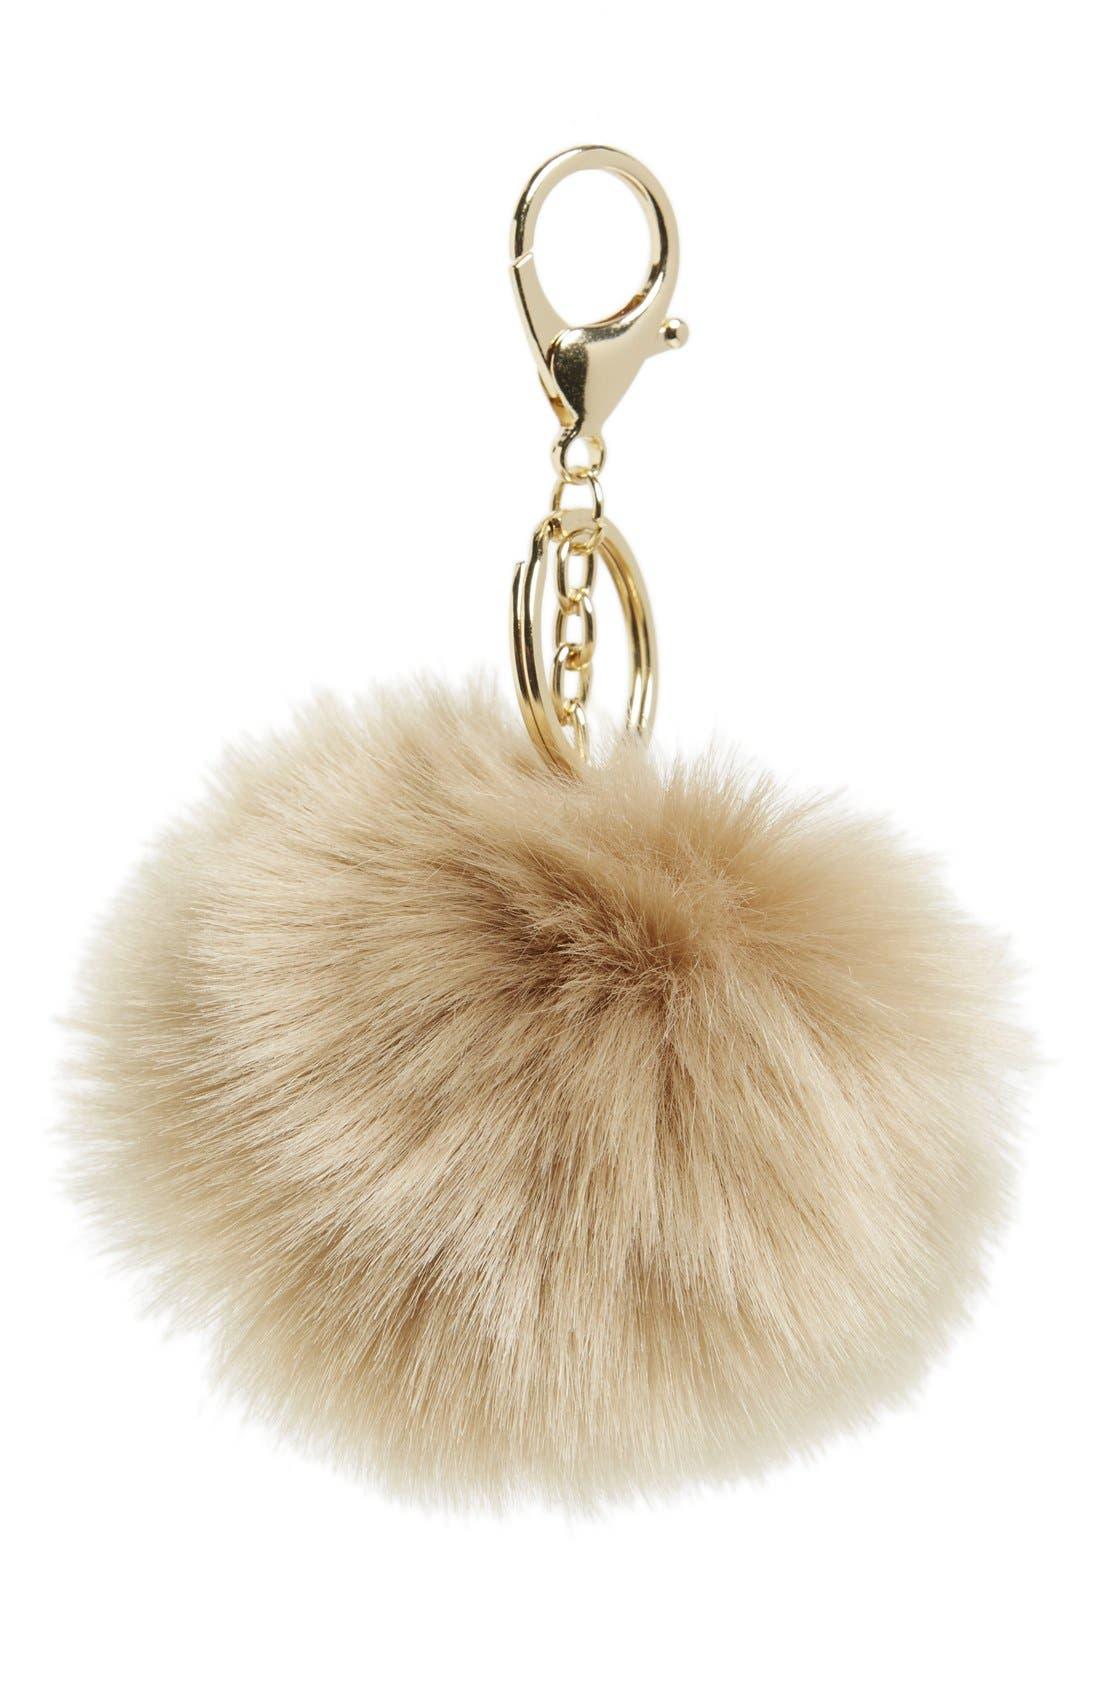 Alternate Image 1 Selected - Shinhwa Faux Fur Pom Keychain